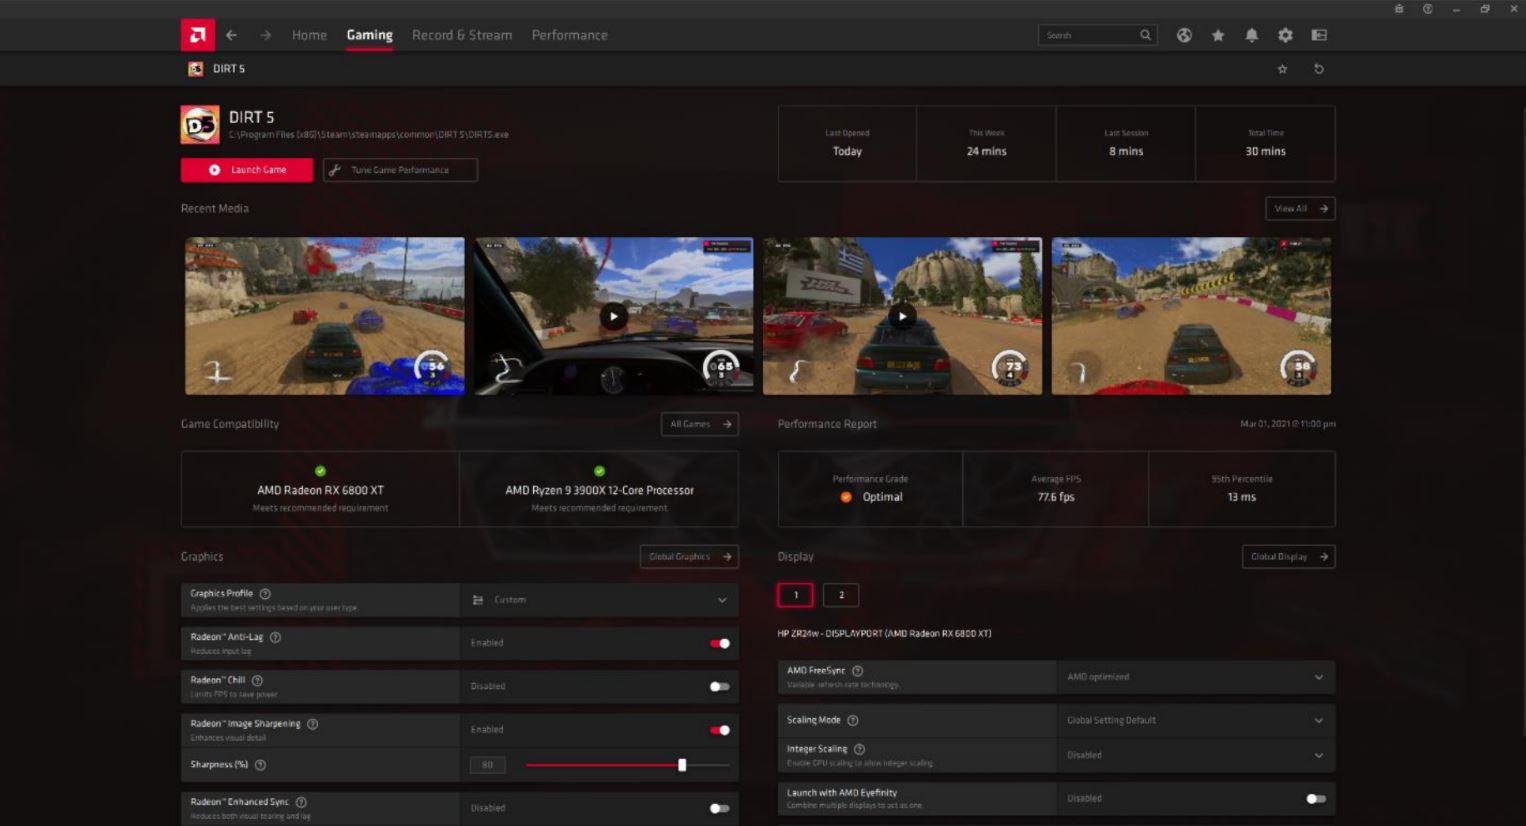 AMD Radeon Software Adrenalin 21.4.1, GamersRd